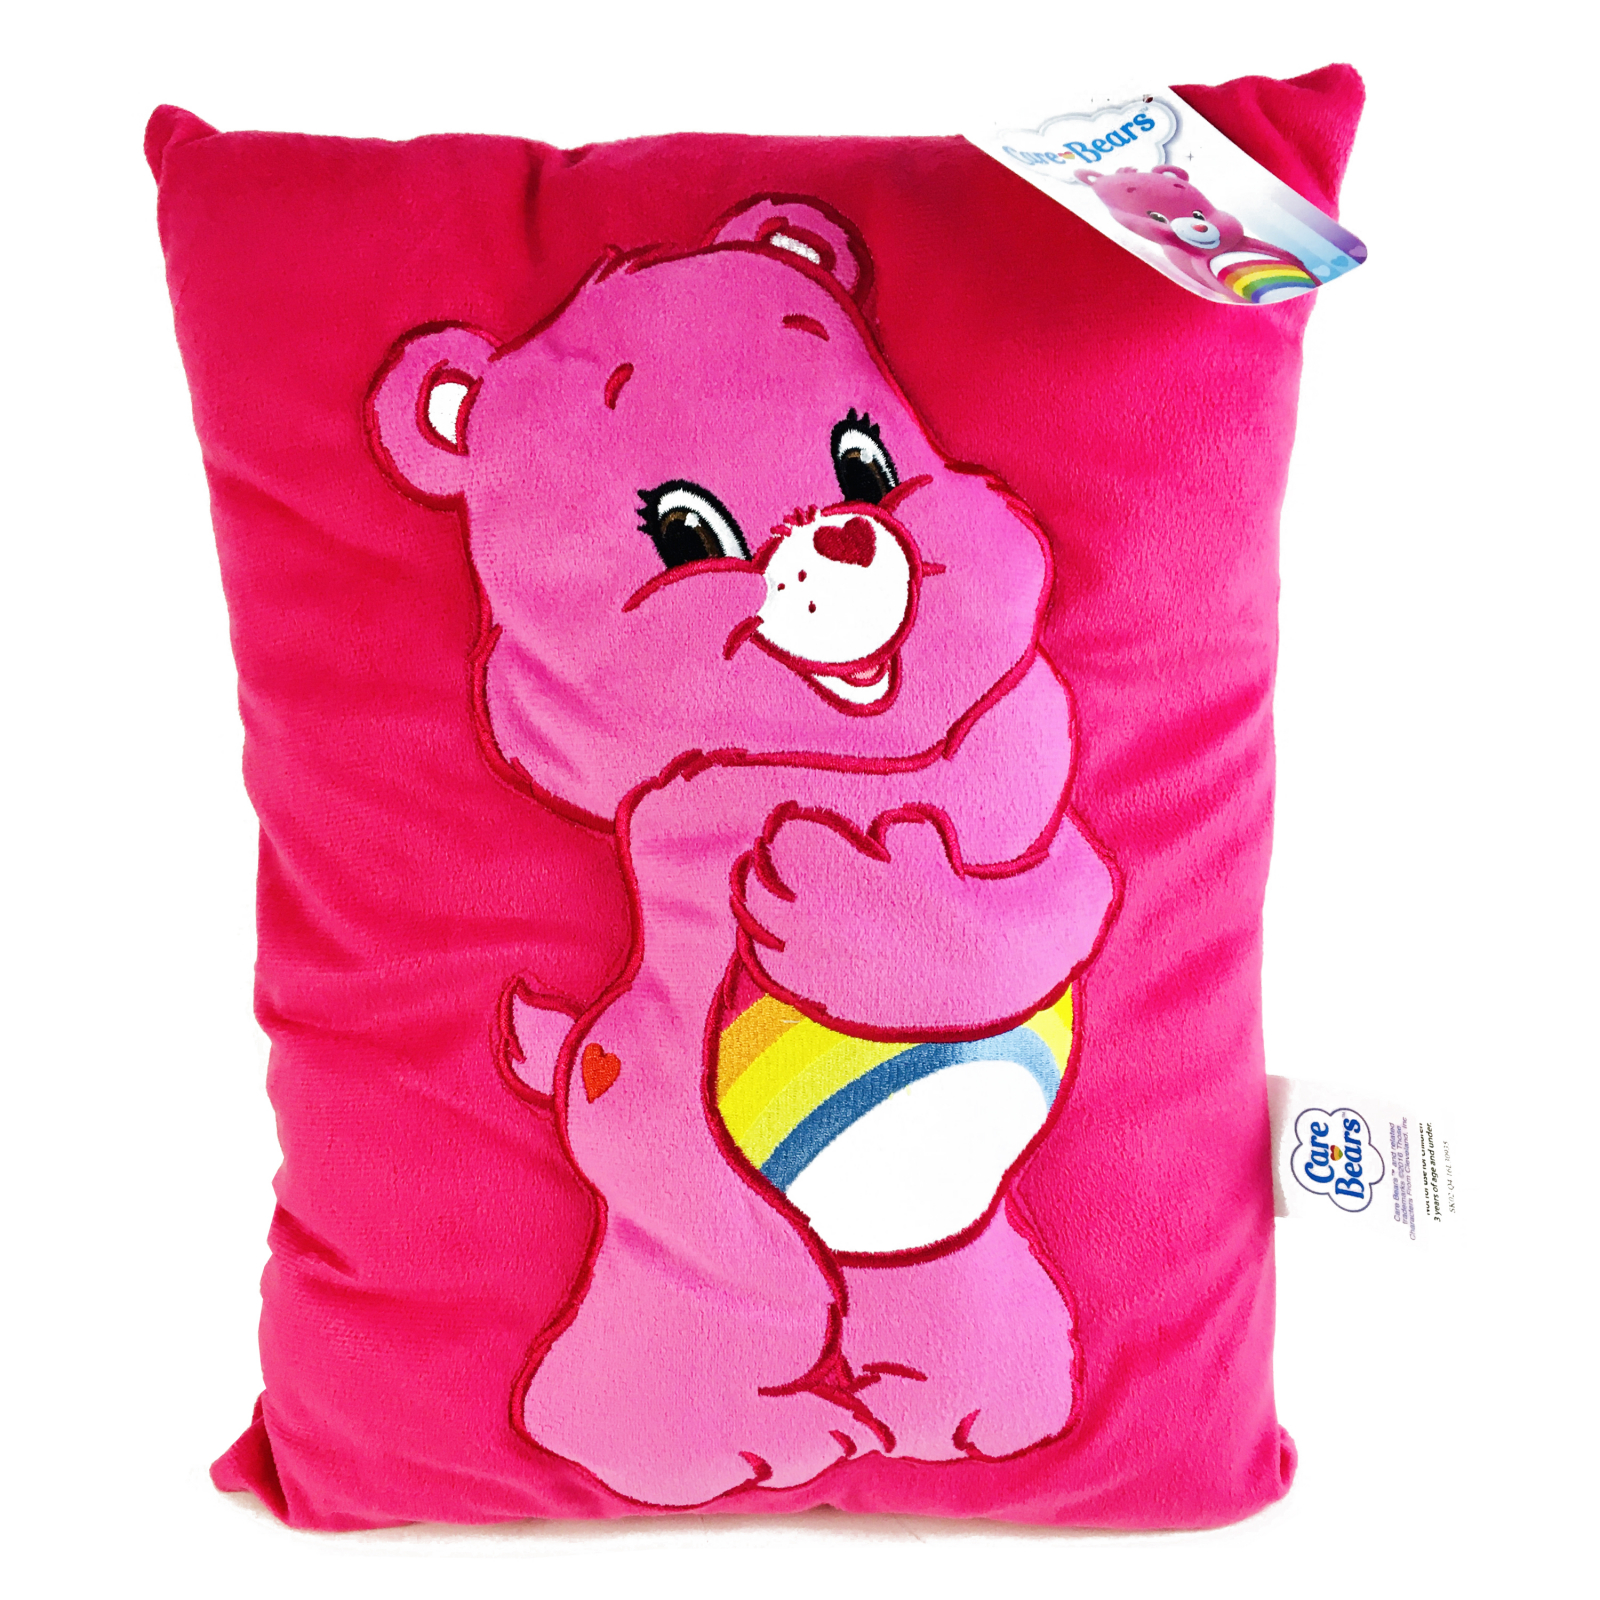 Care Bears Cheer Bear Kids Decorative 3D Plush Cuddle Pillow